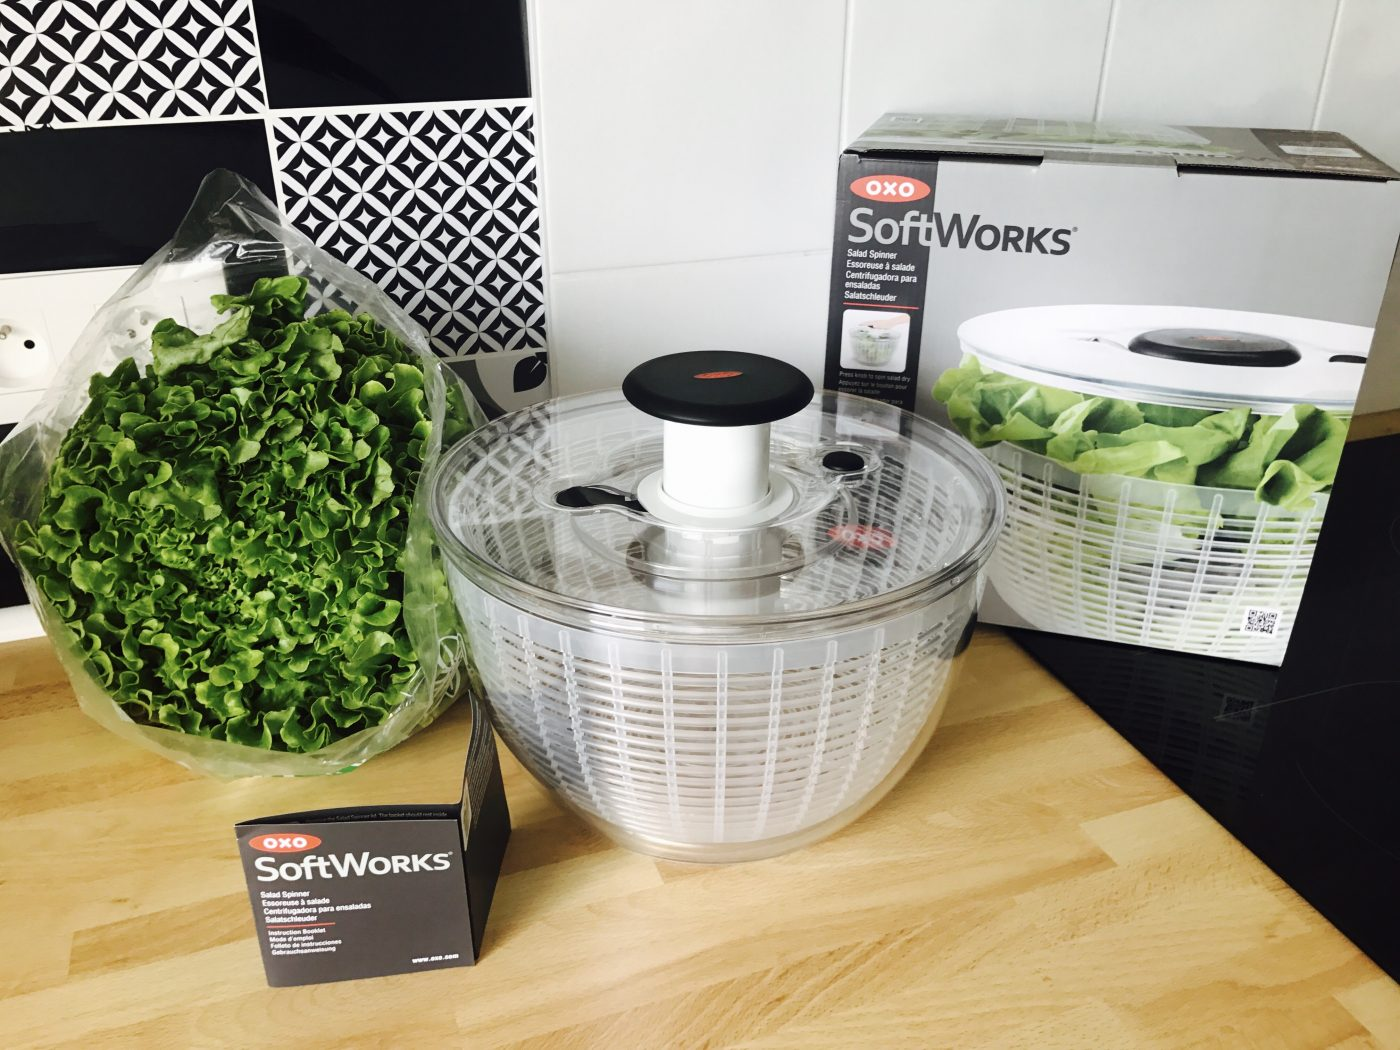 J'ai testé pour vous l'essoreuse à salade OXO  SoftWorks